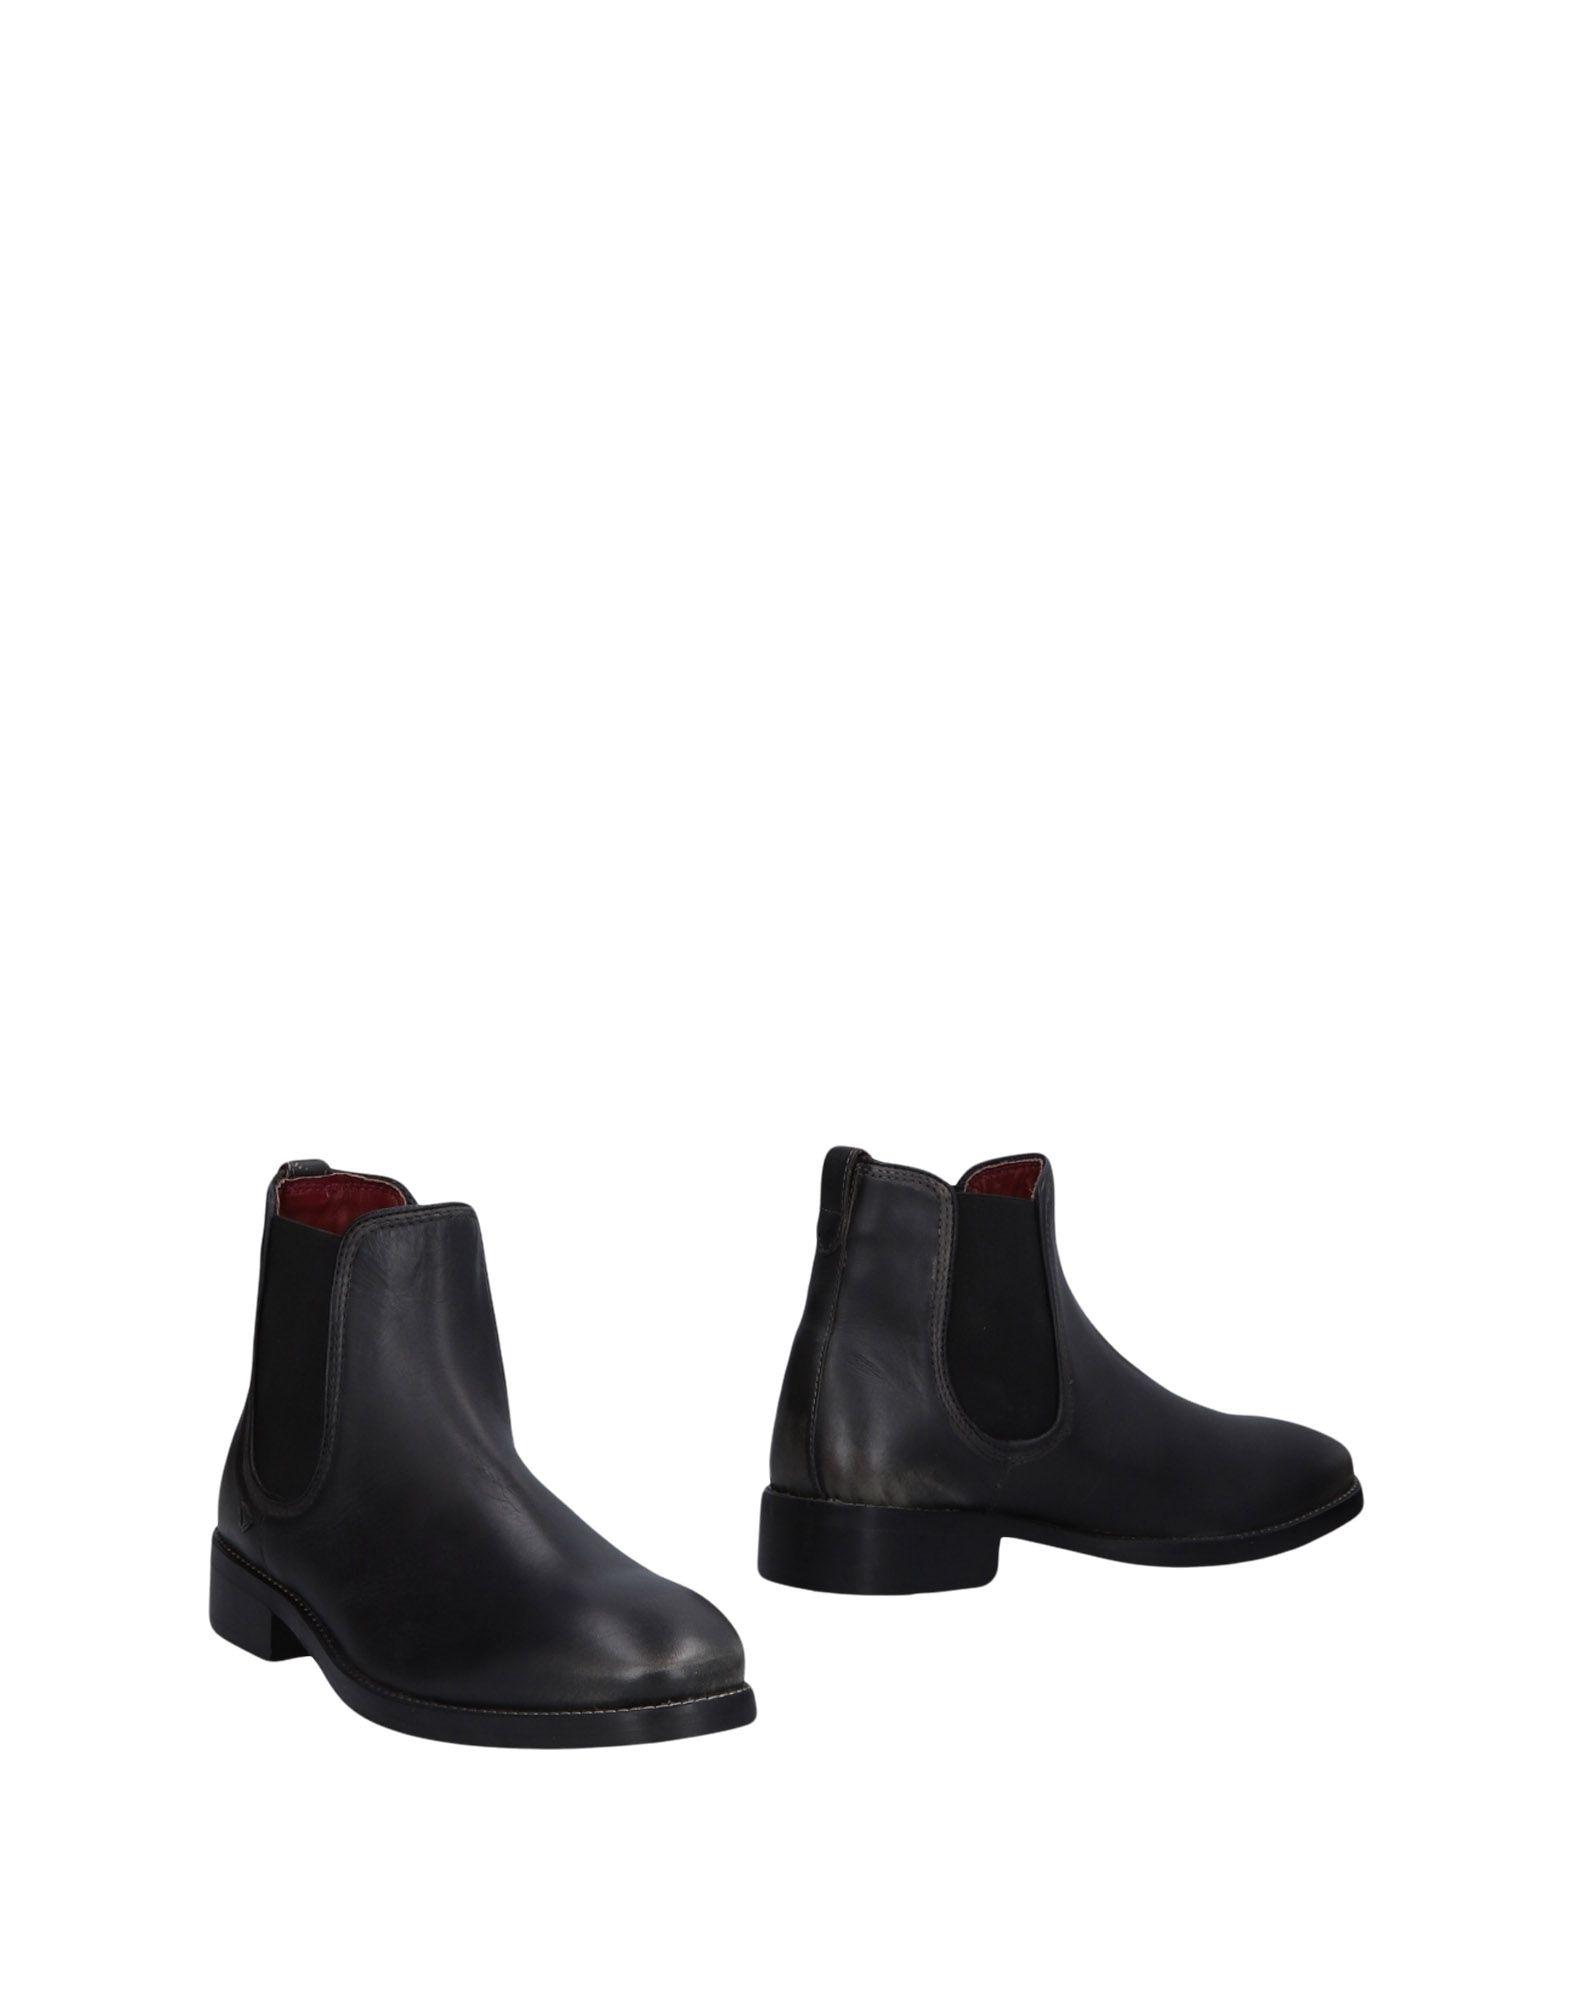 Rabatt echte Schuhe Herren Guess Stiefelette Herren Schuhe  11467203PQ 3e3a02